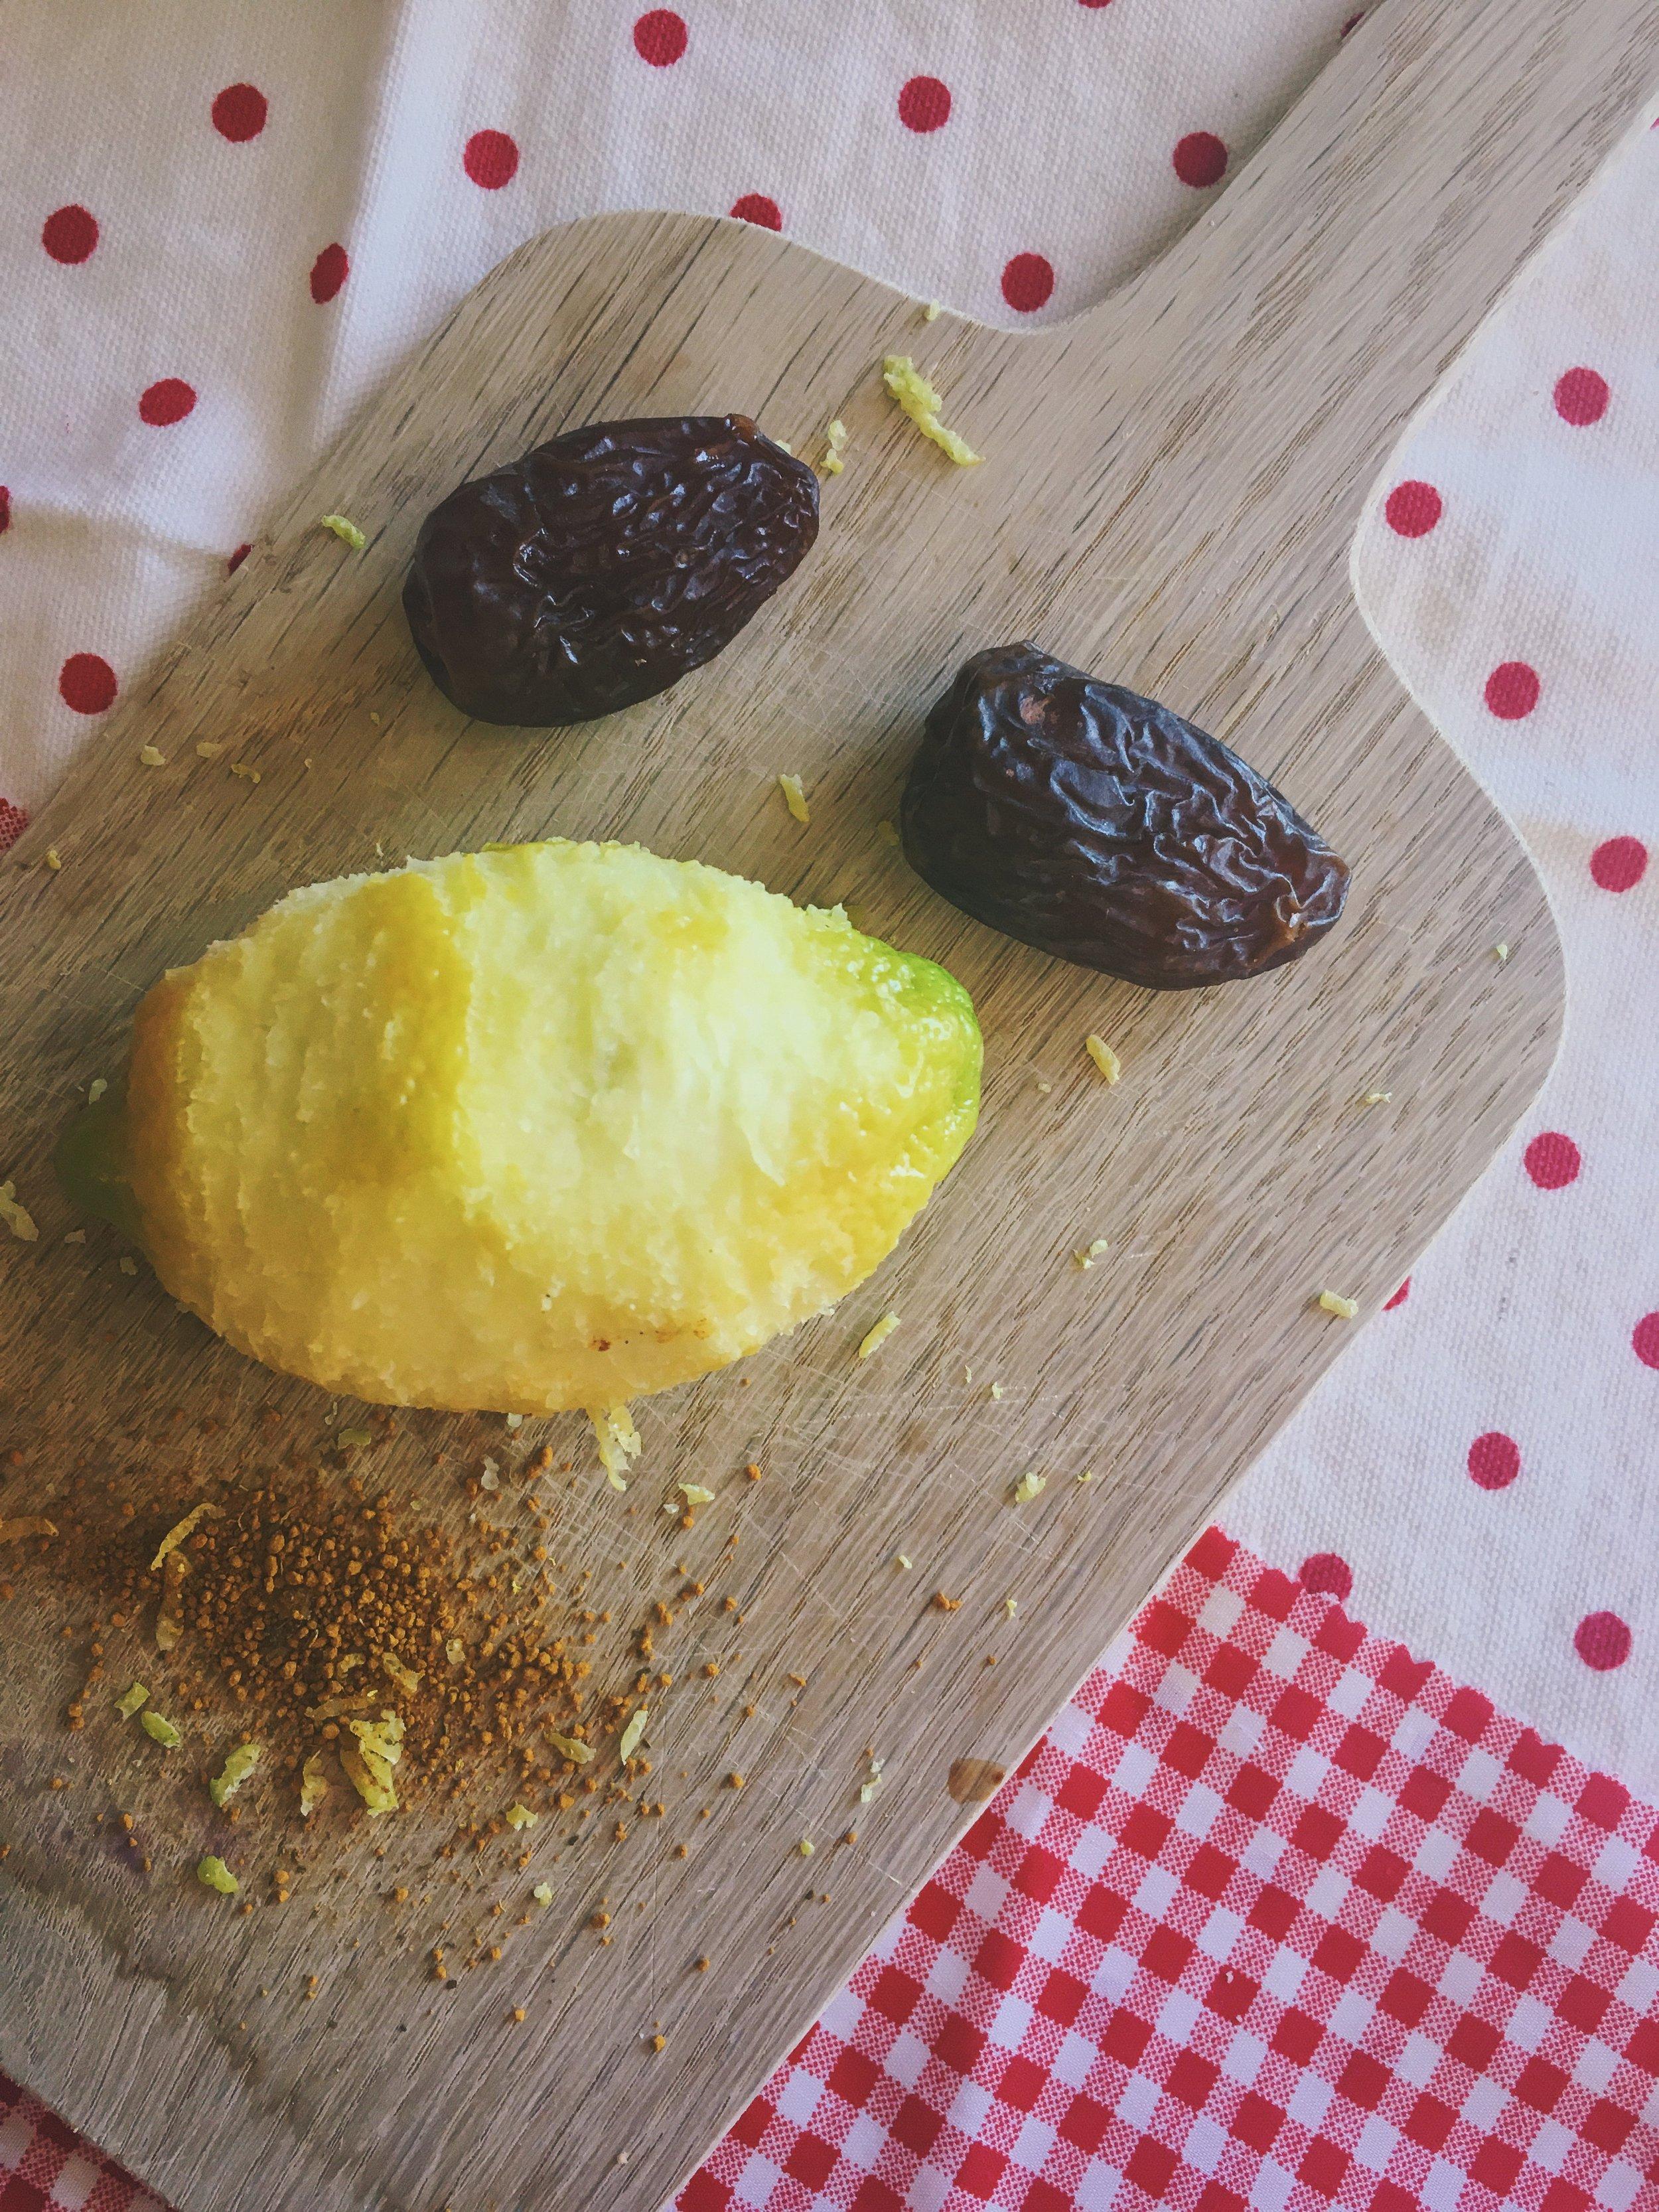 lemon zest, medjool dates and turmeric on a wooden board